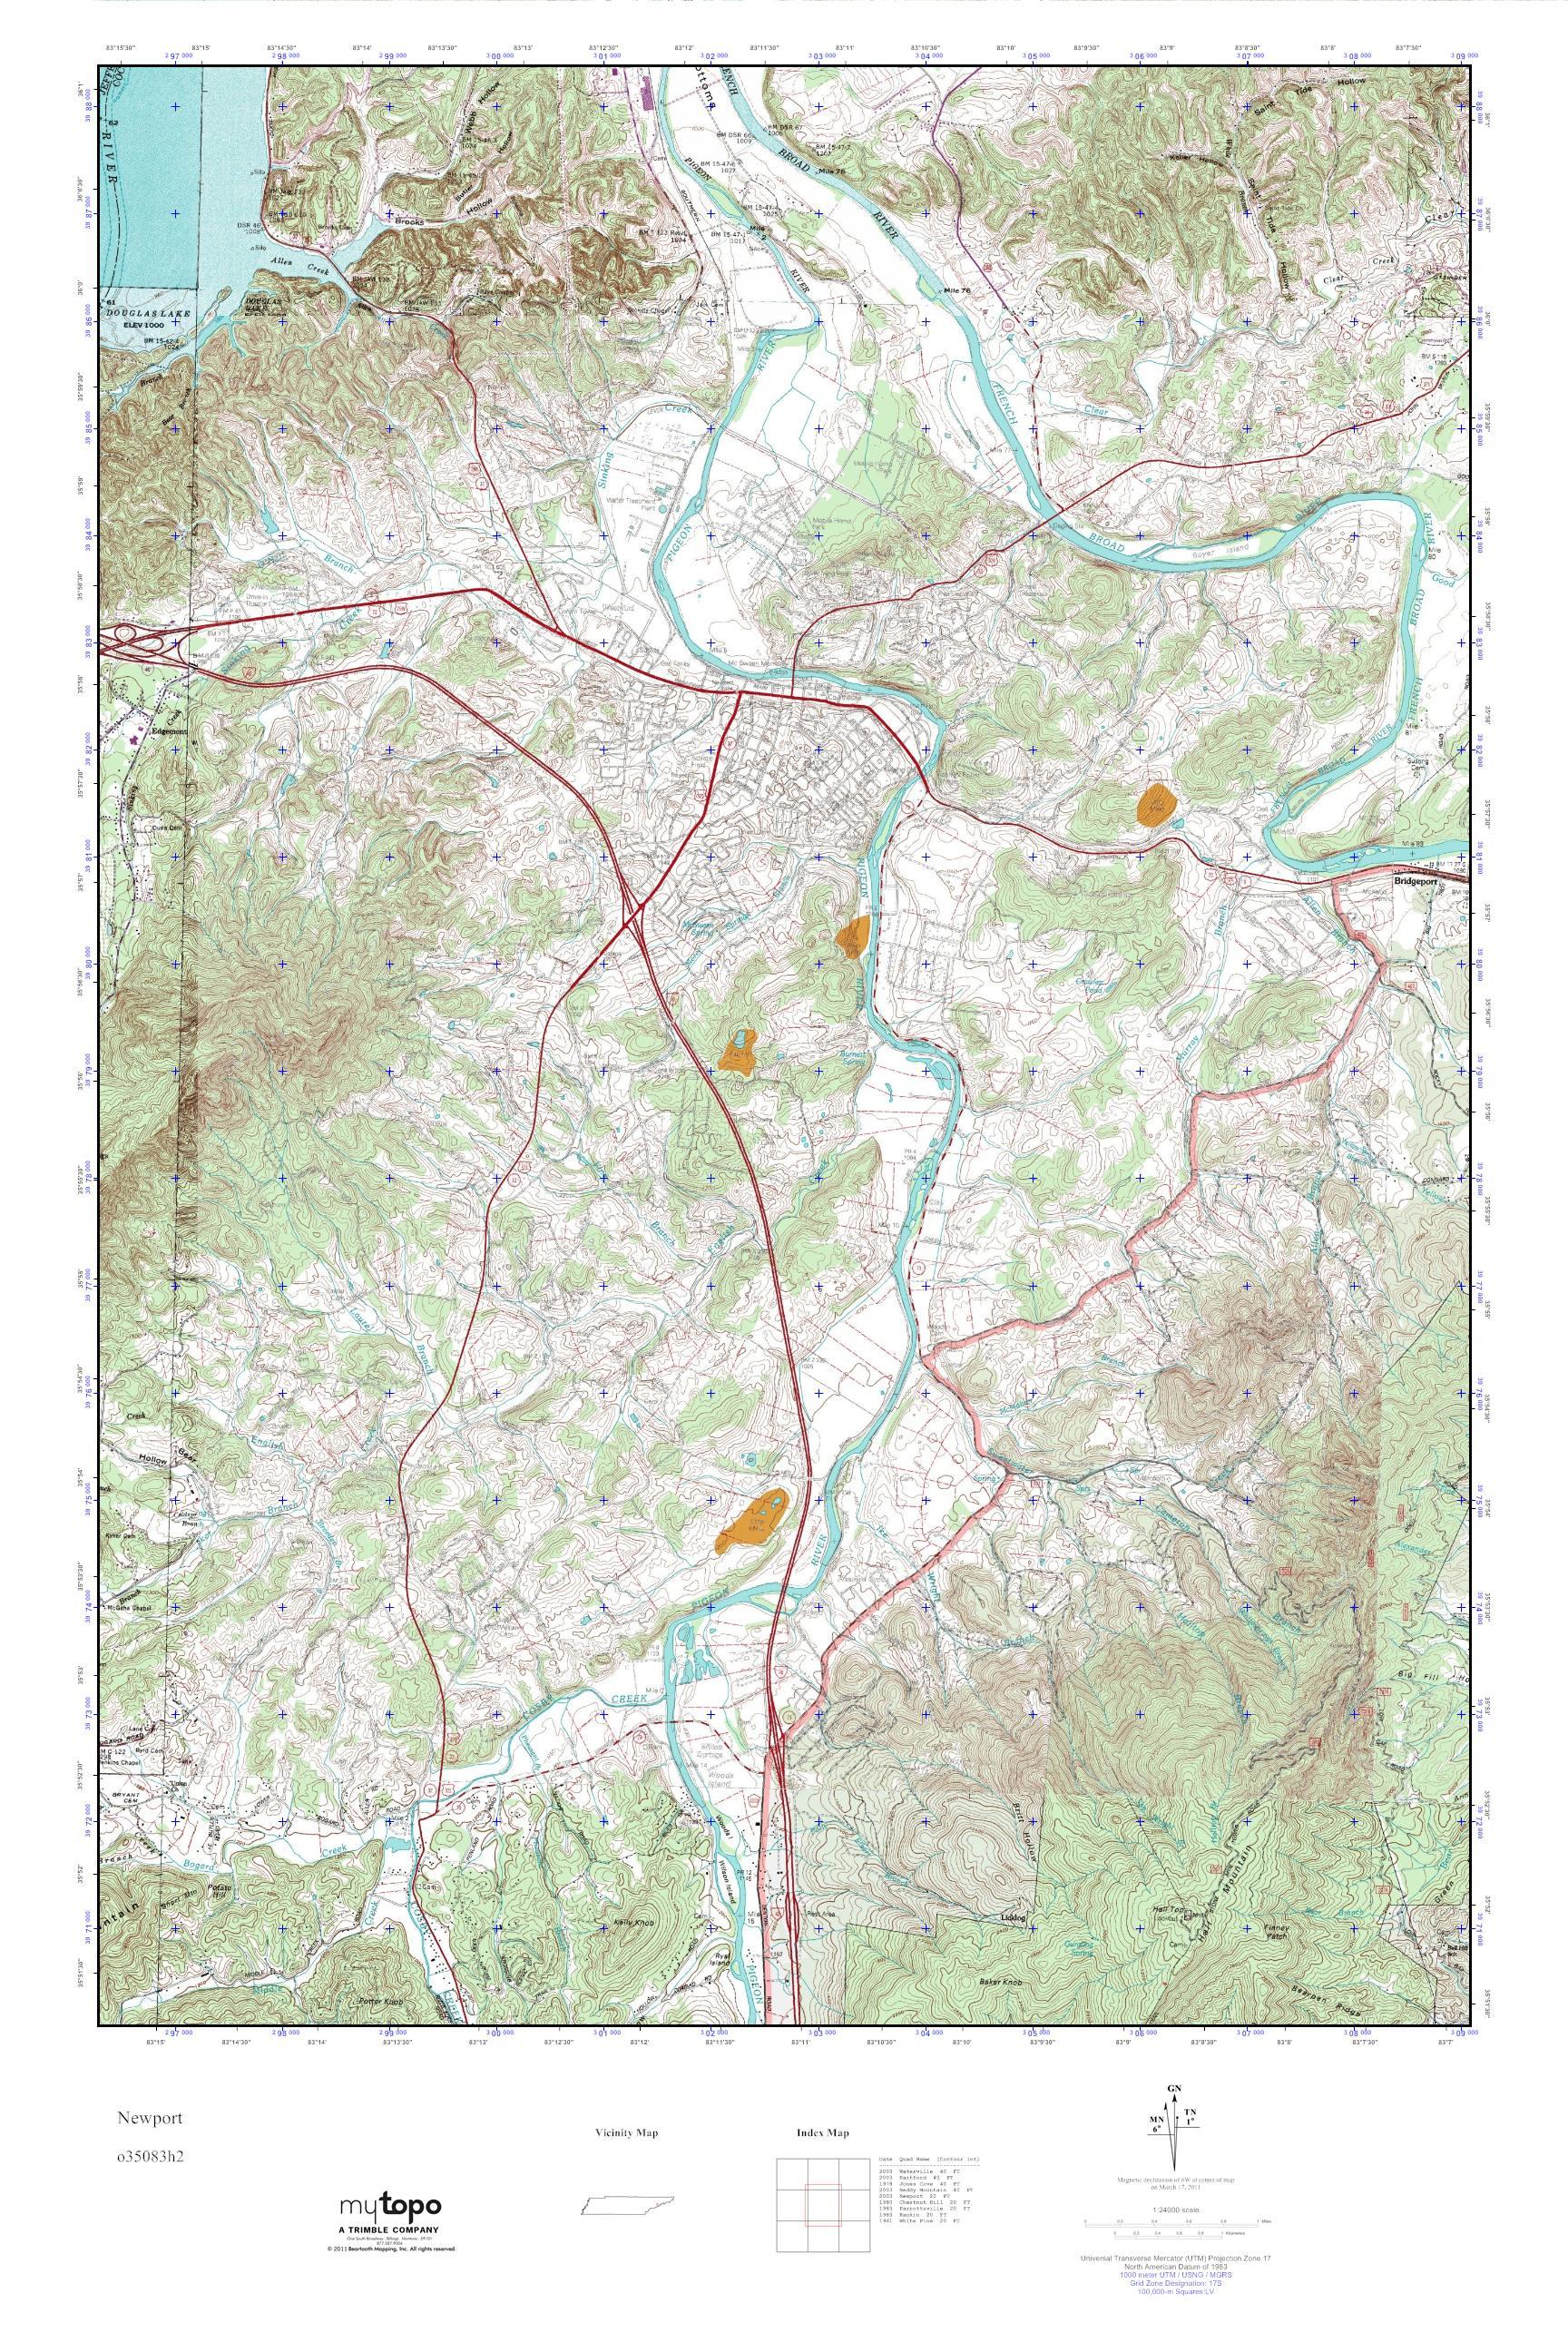 Mytopo Newport Tennessee Usgs Quad Topo Map